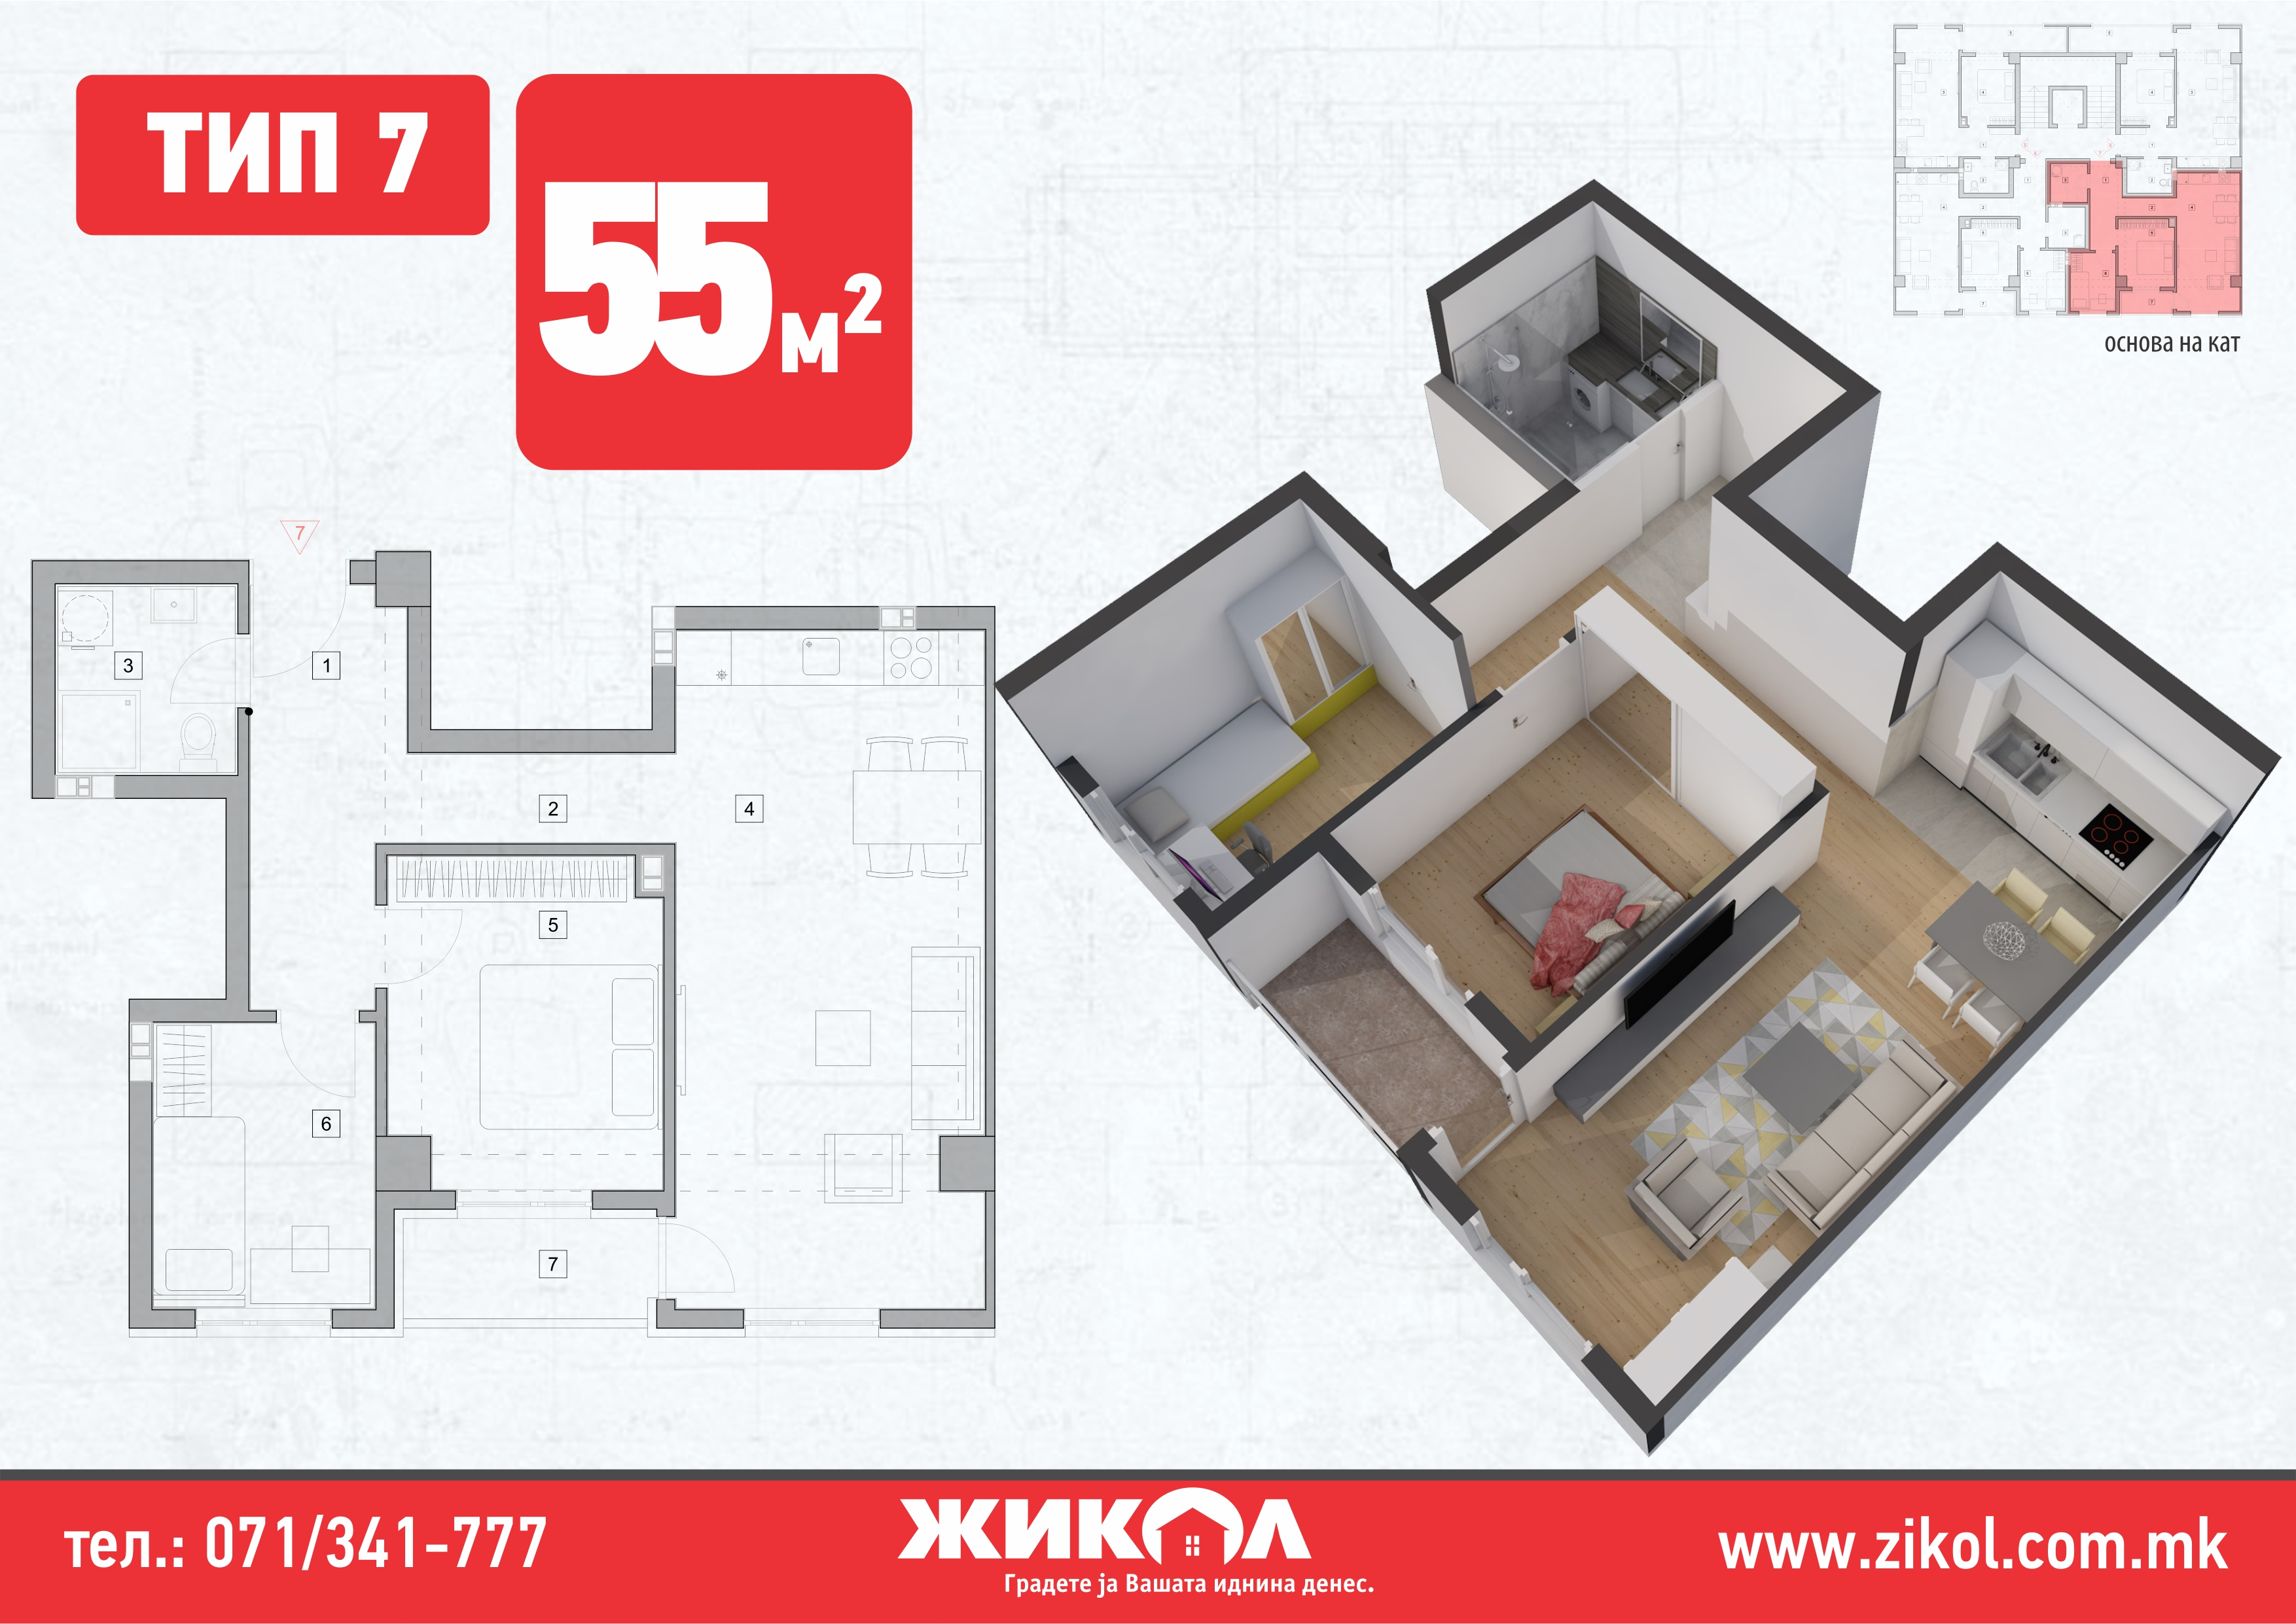 зграда 8, кат 4, стан 19